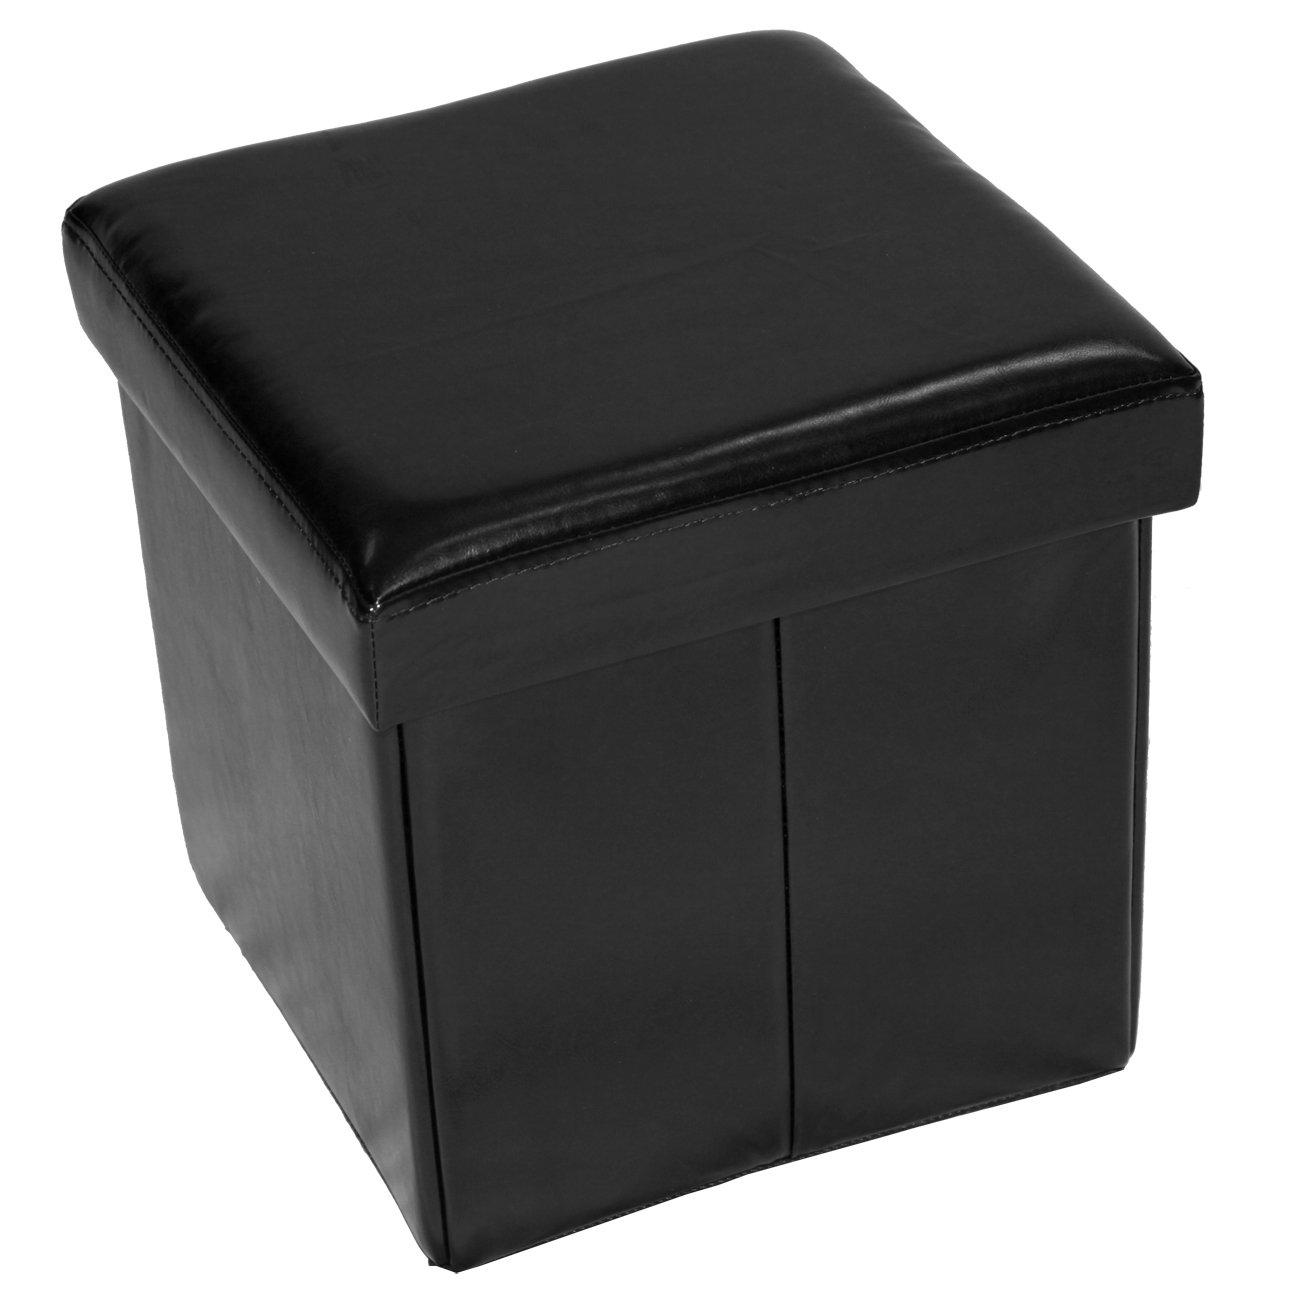 Home furnishings small folding storage ottoman black ebay for Small ottoman storage